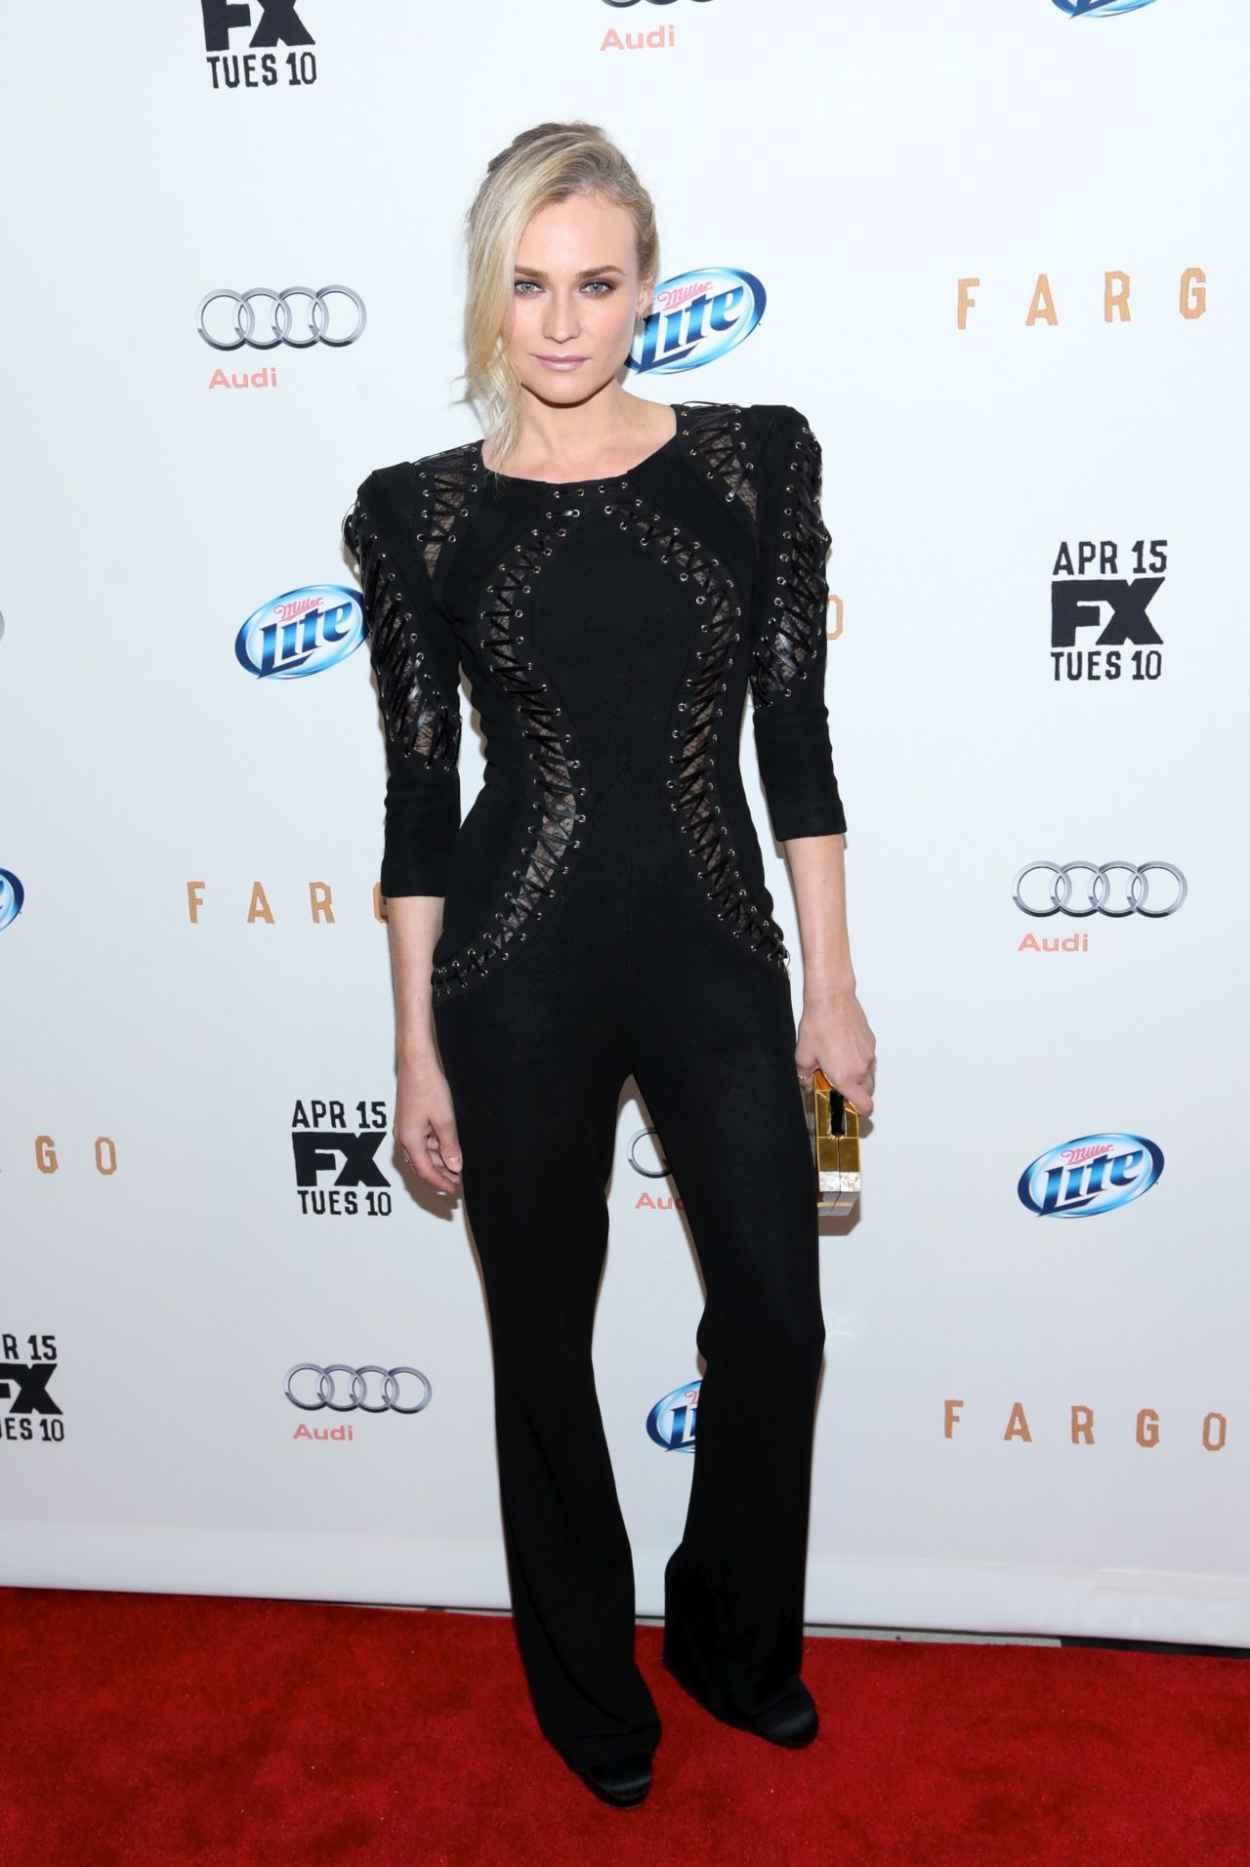 Diane Kruger Wearing Zuhair Murad at FX Networks Upfront Screening of Fargo in New York City-1